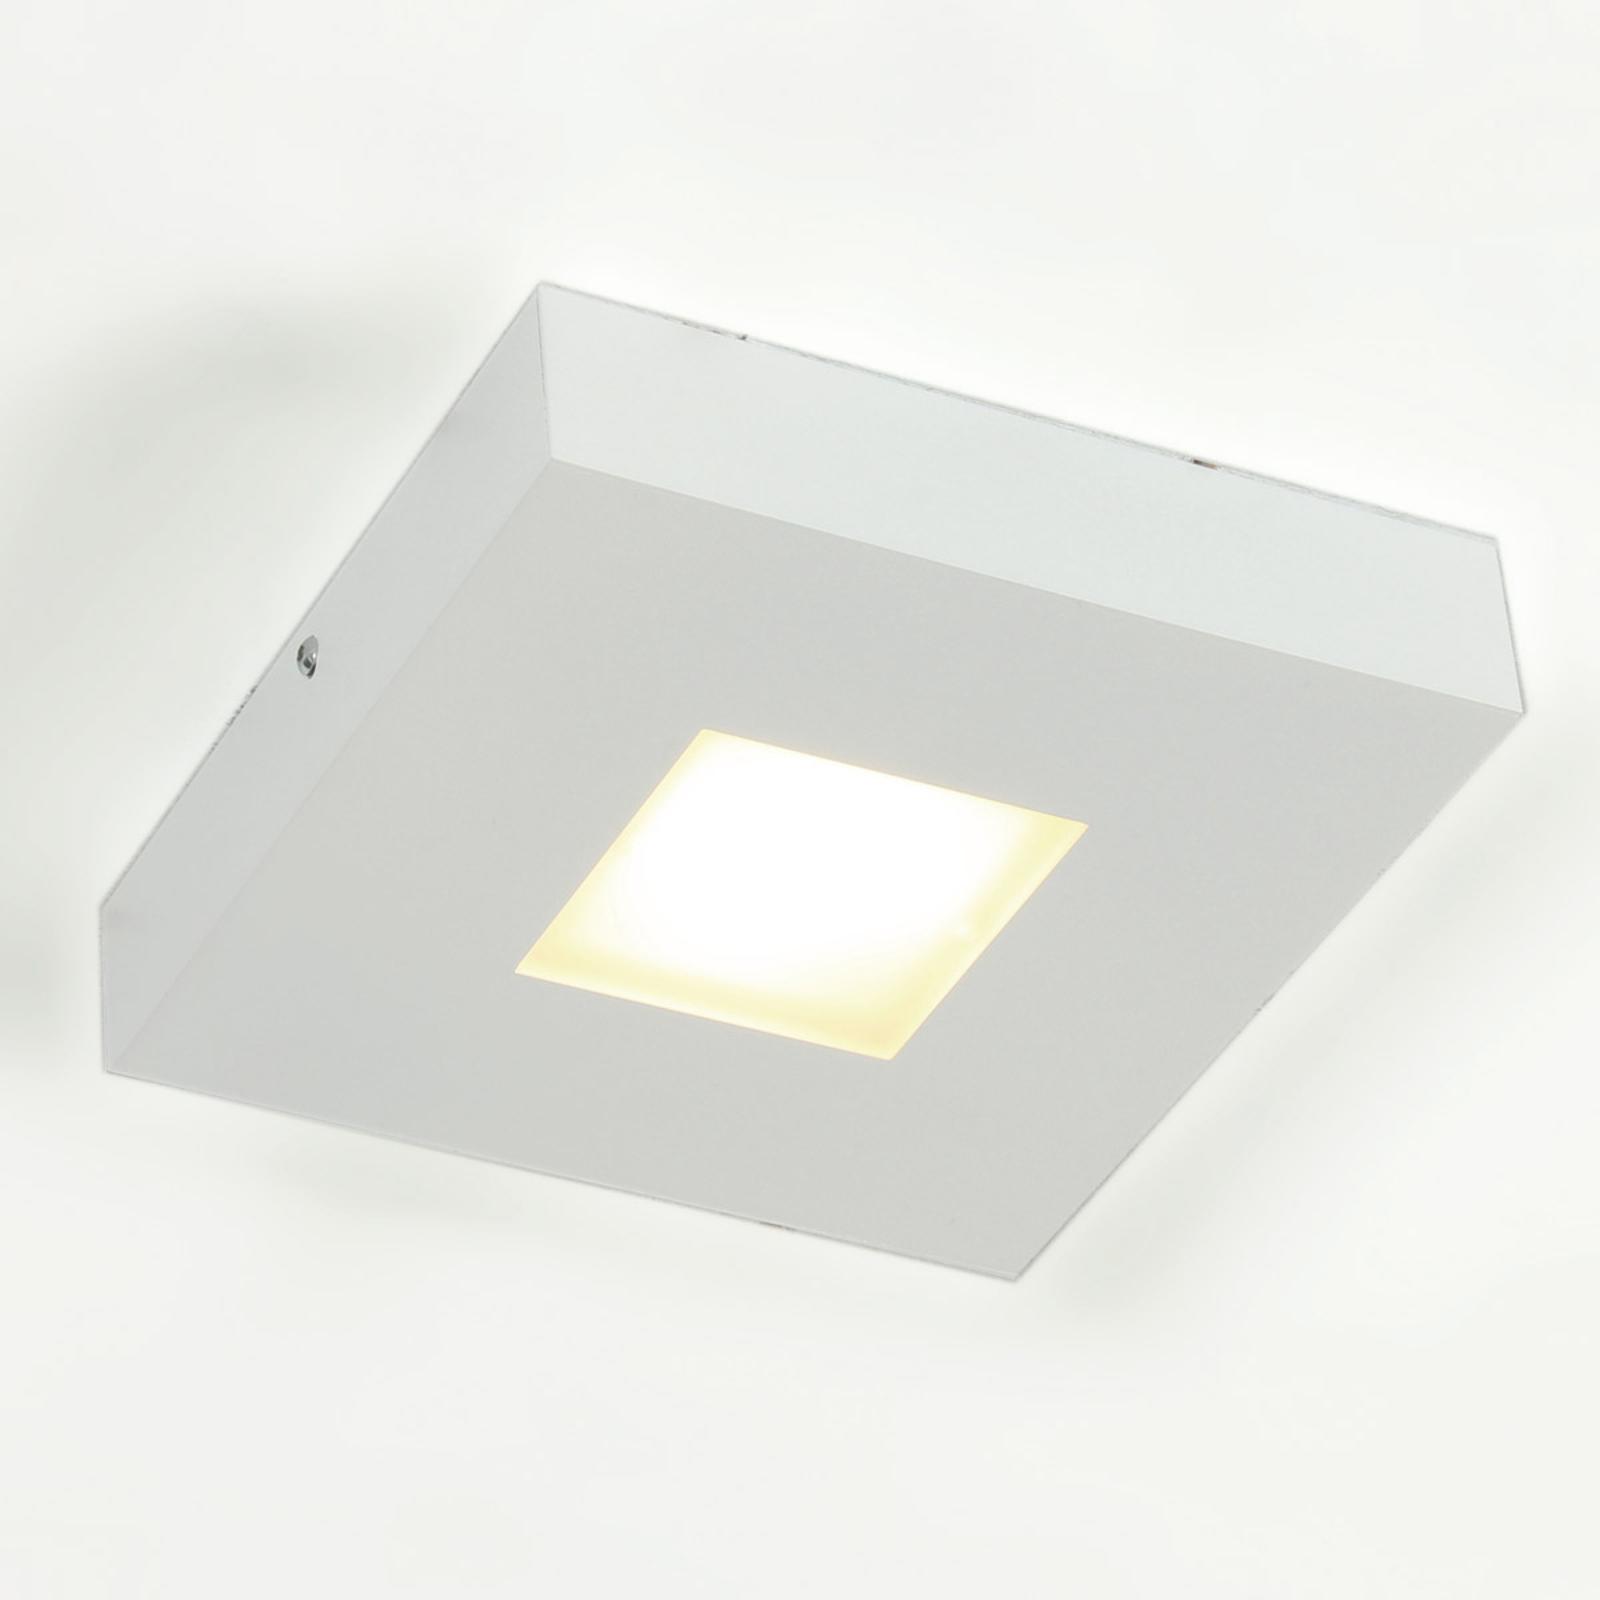 Plafón LED Cubus de alta calidad, blanco